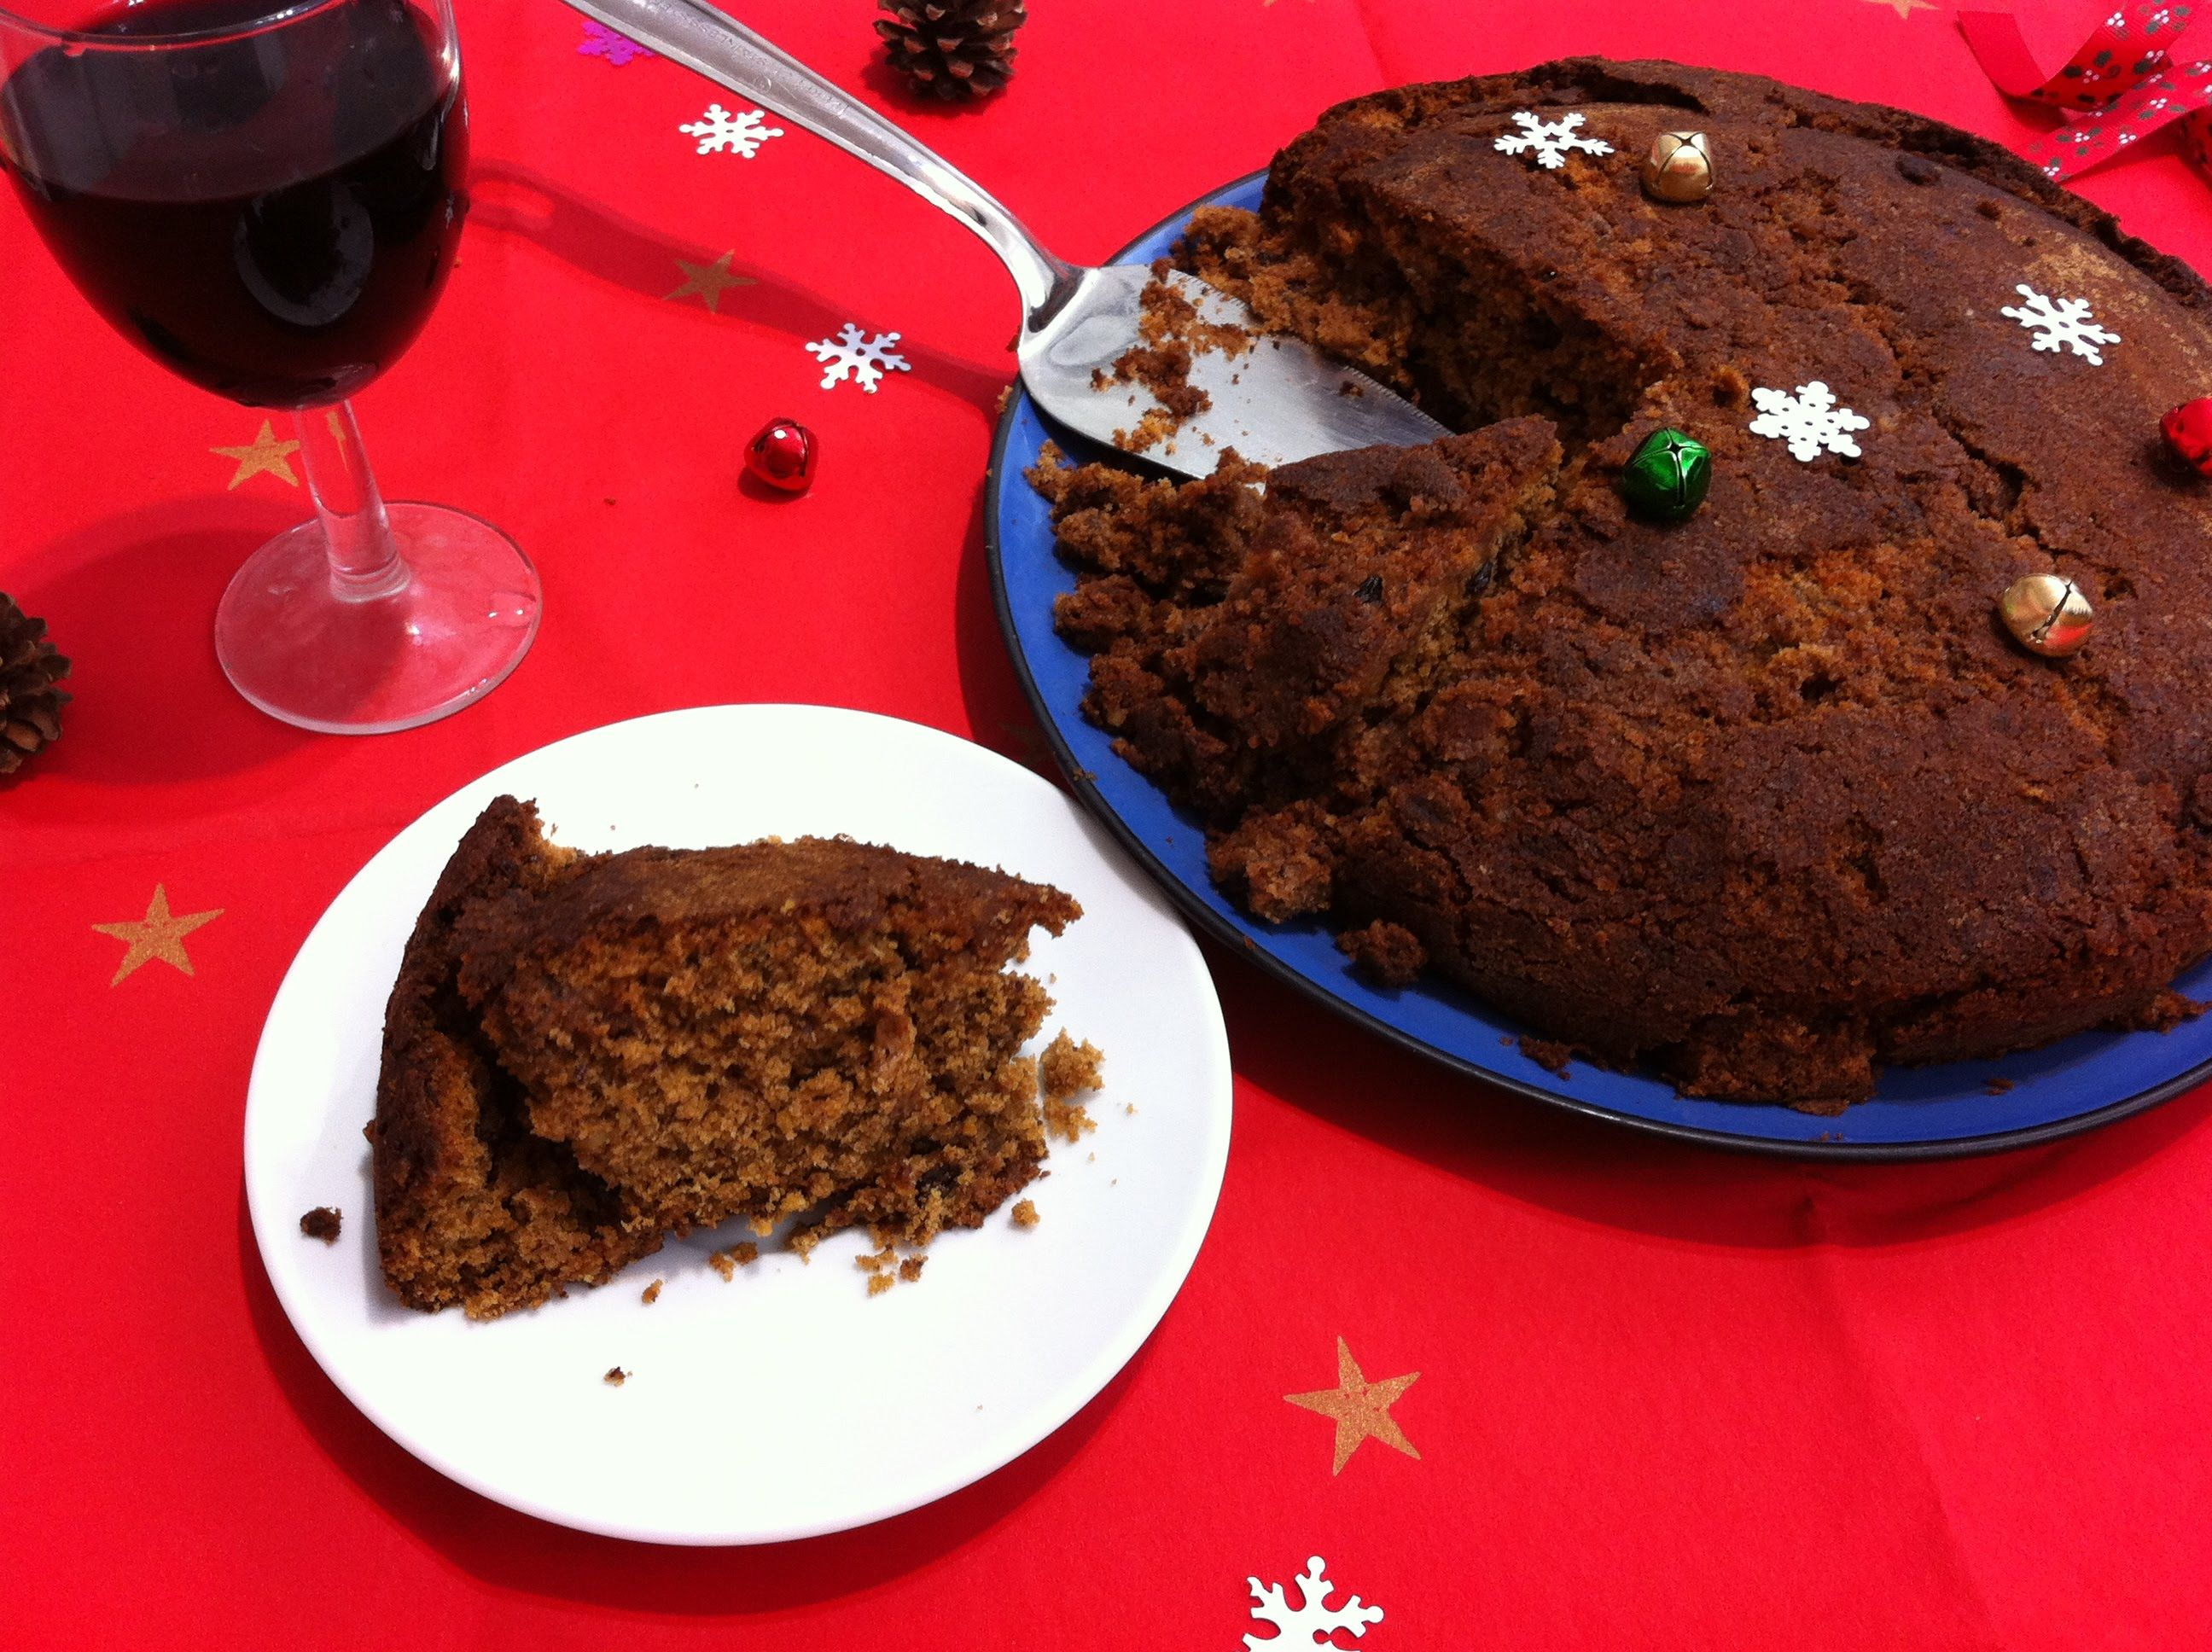 How To Make Wine Rum Spice Cake Rum Fruit Cake Fruit Cake Cake Recipes